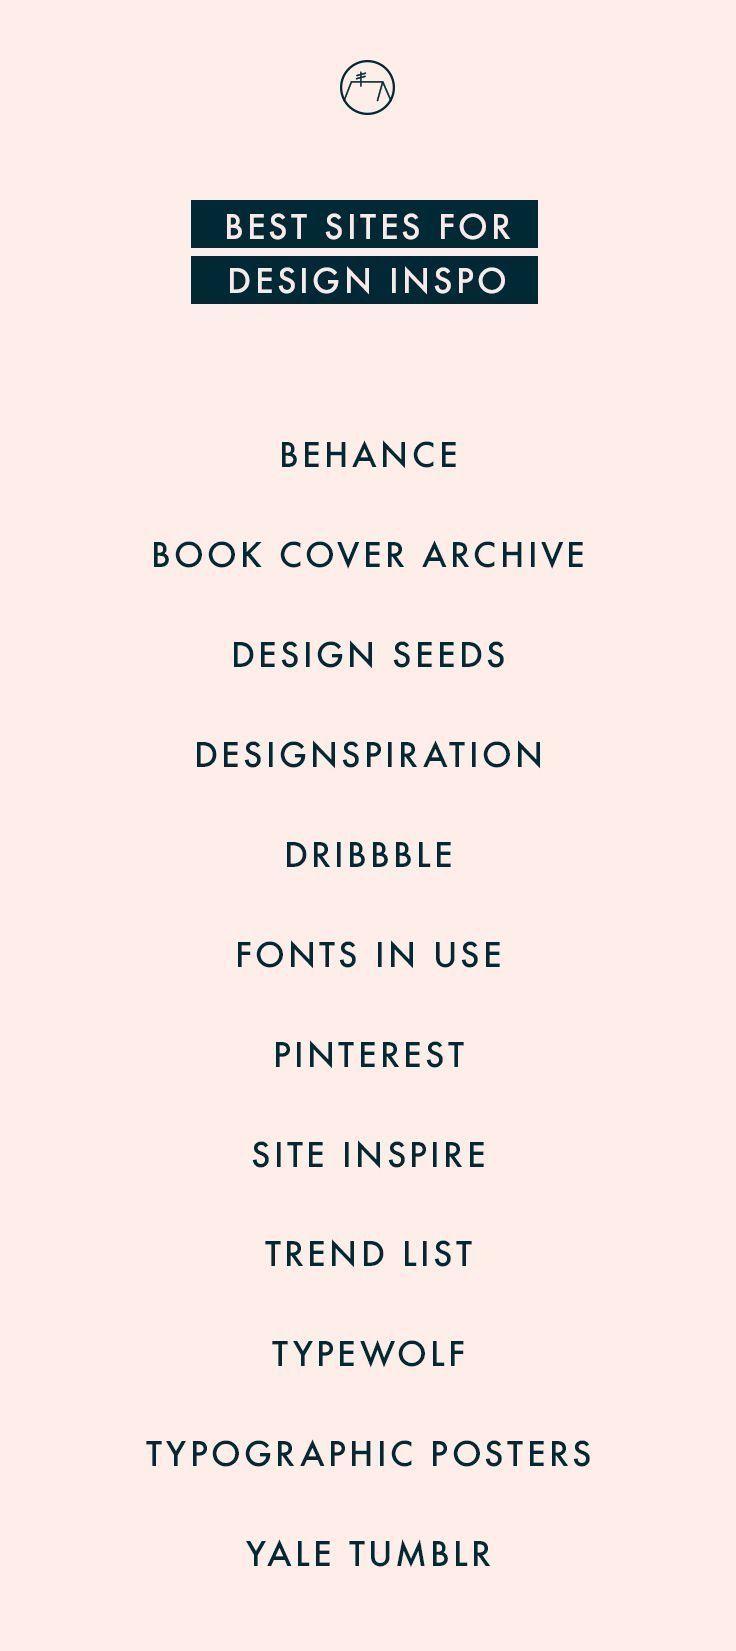 7 großartige Online-Kurse für Illustrator-Anfänger  https://mireia.yazilimyukle.com/2019/09/2... #graphicdesign